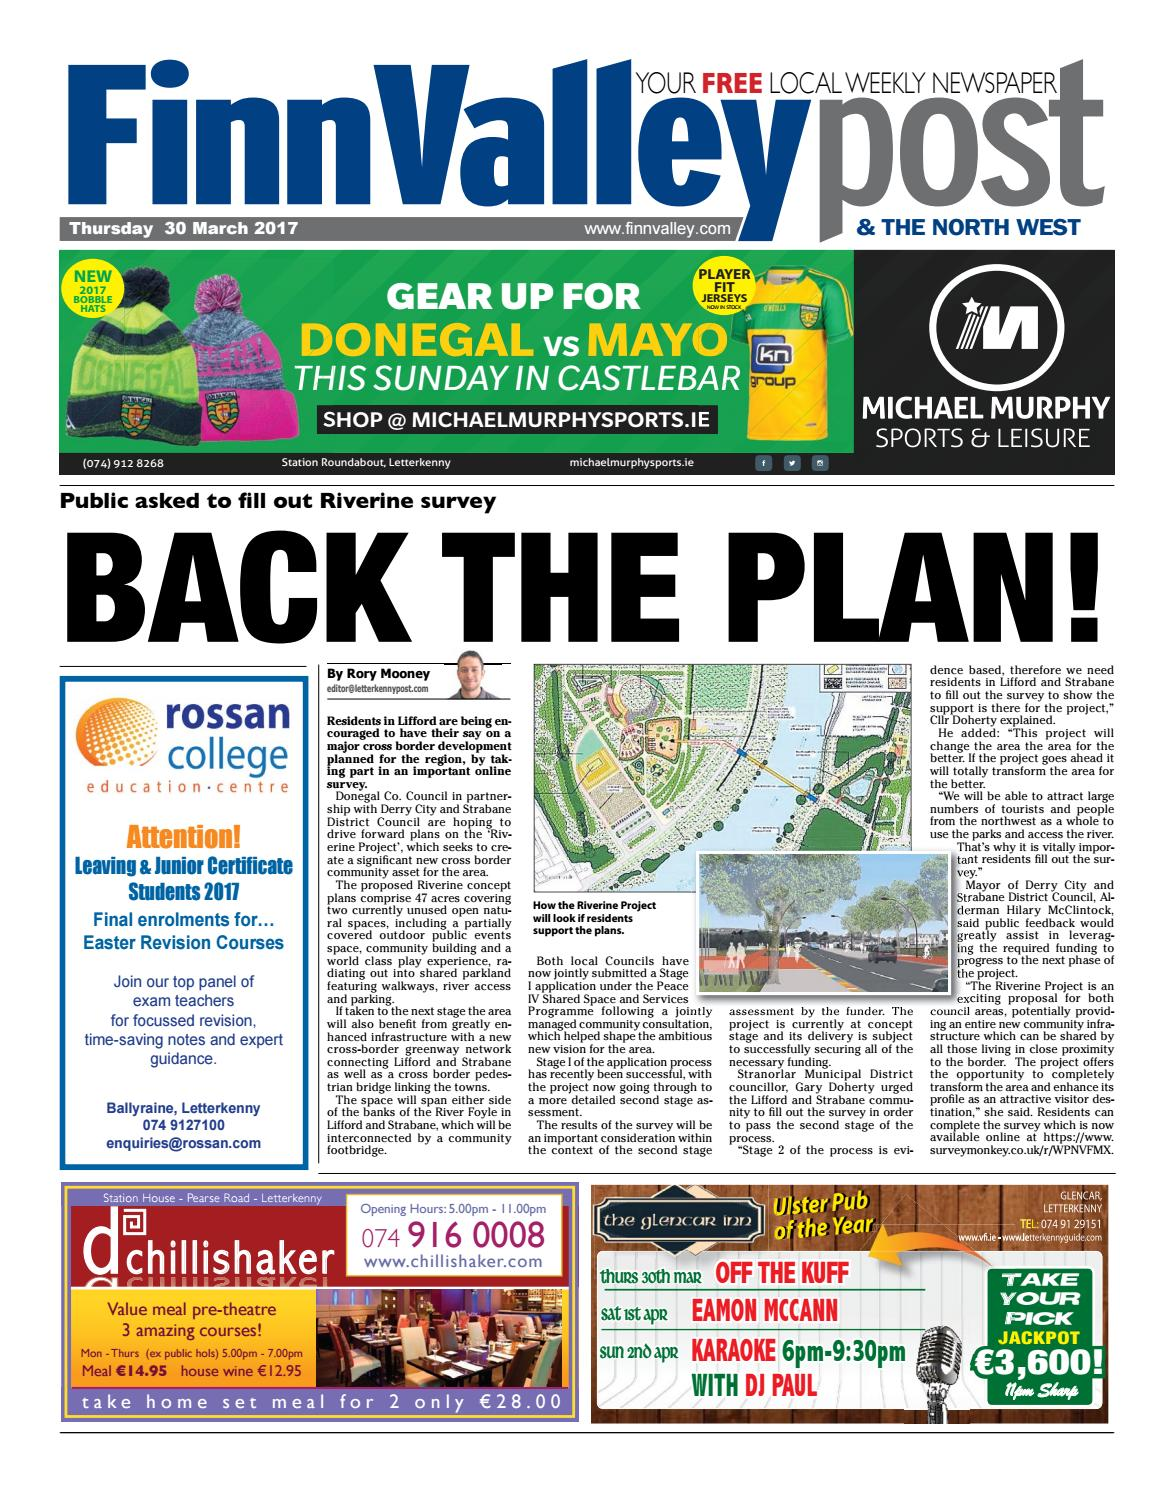 cbf566c44e Finn valley post 30 03 17 by River Media Newspapers - issuu